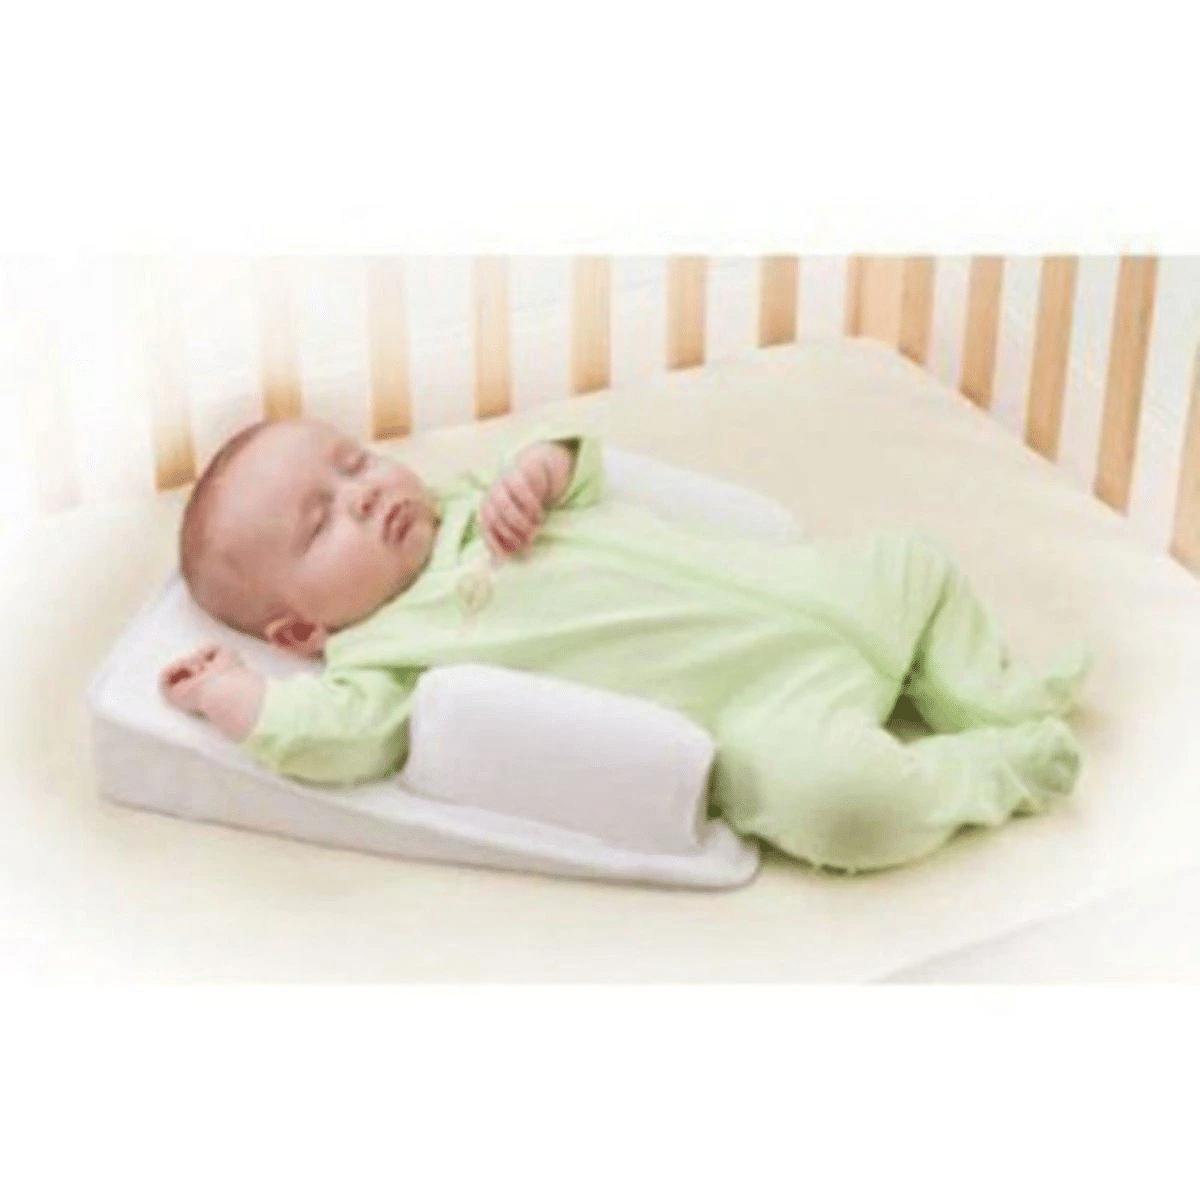 Newborn Baby Sleep Fixed Position & Anti Roll Pillow